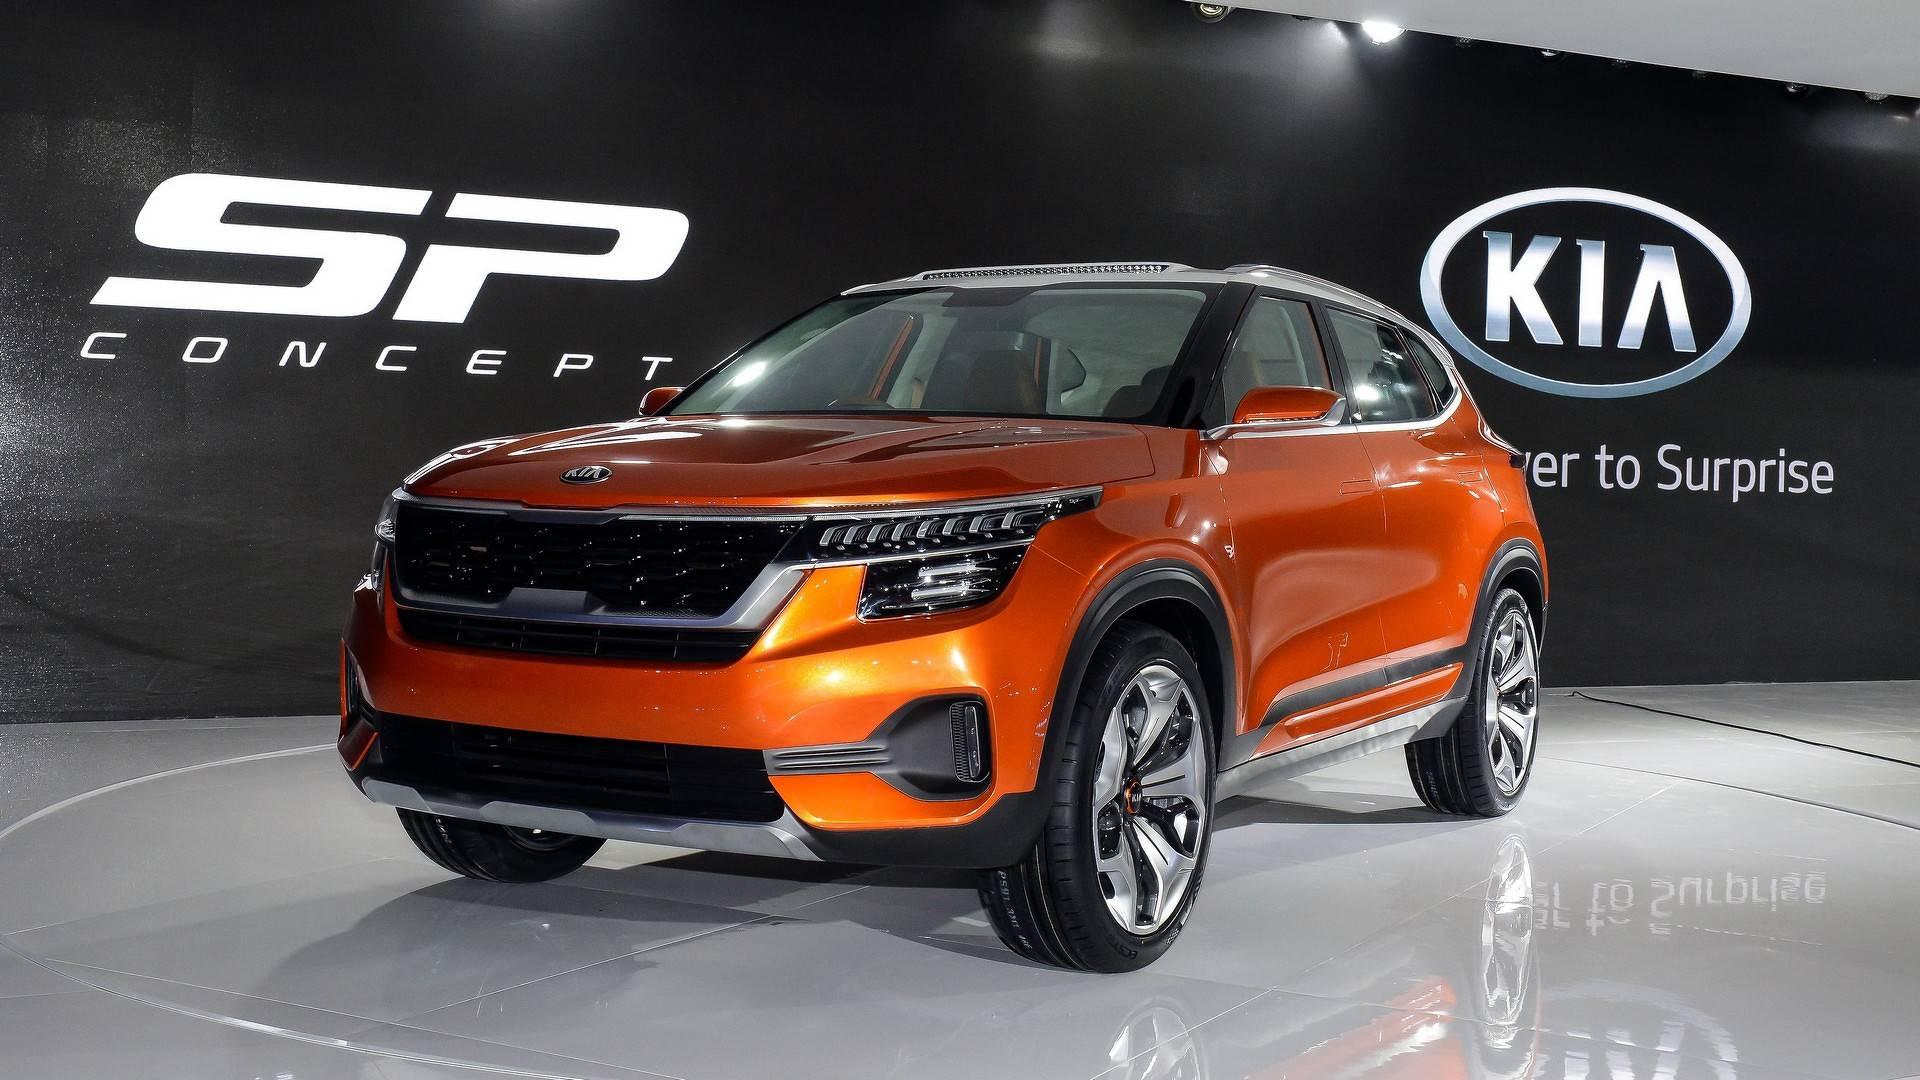 5a7aae0a1109f 2018 kia sp concept کیا رسما در هند با مفهوم SP در نمایشگاه خودرو ۲۰۱۸ آغاز می شود   اجاره ماشین